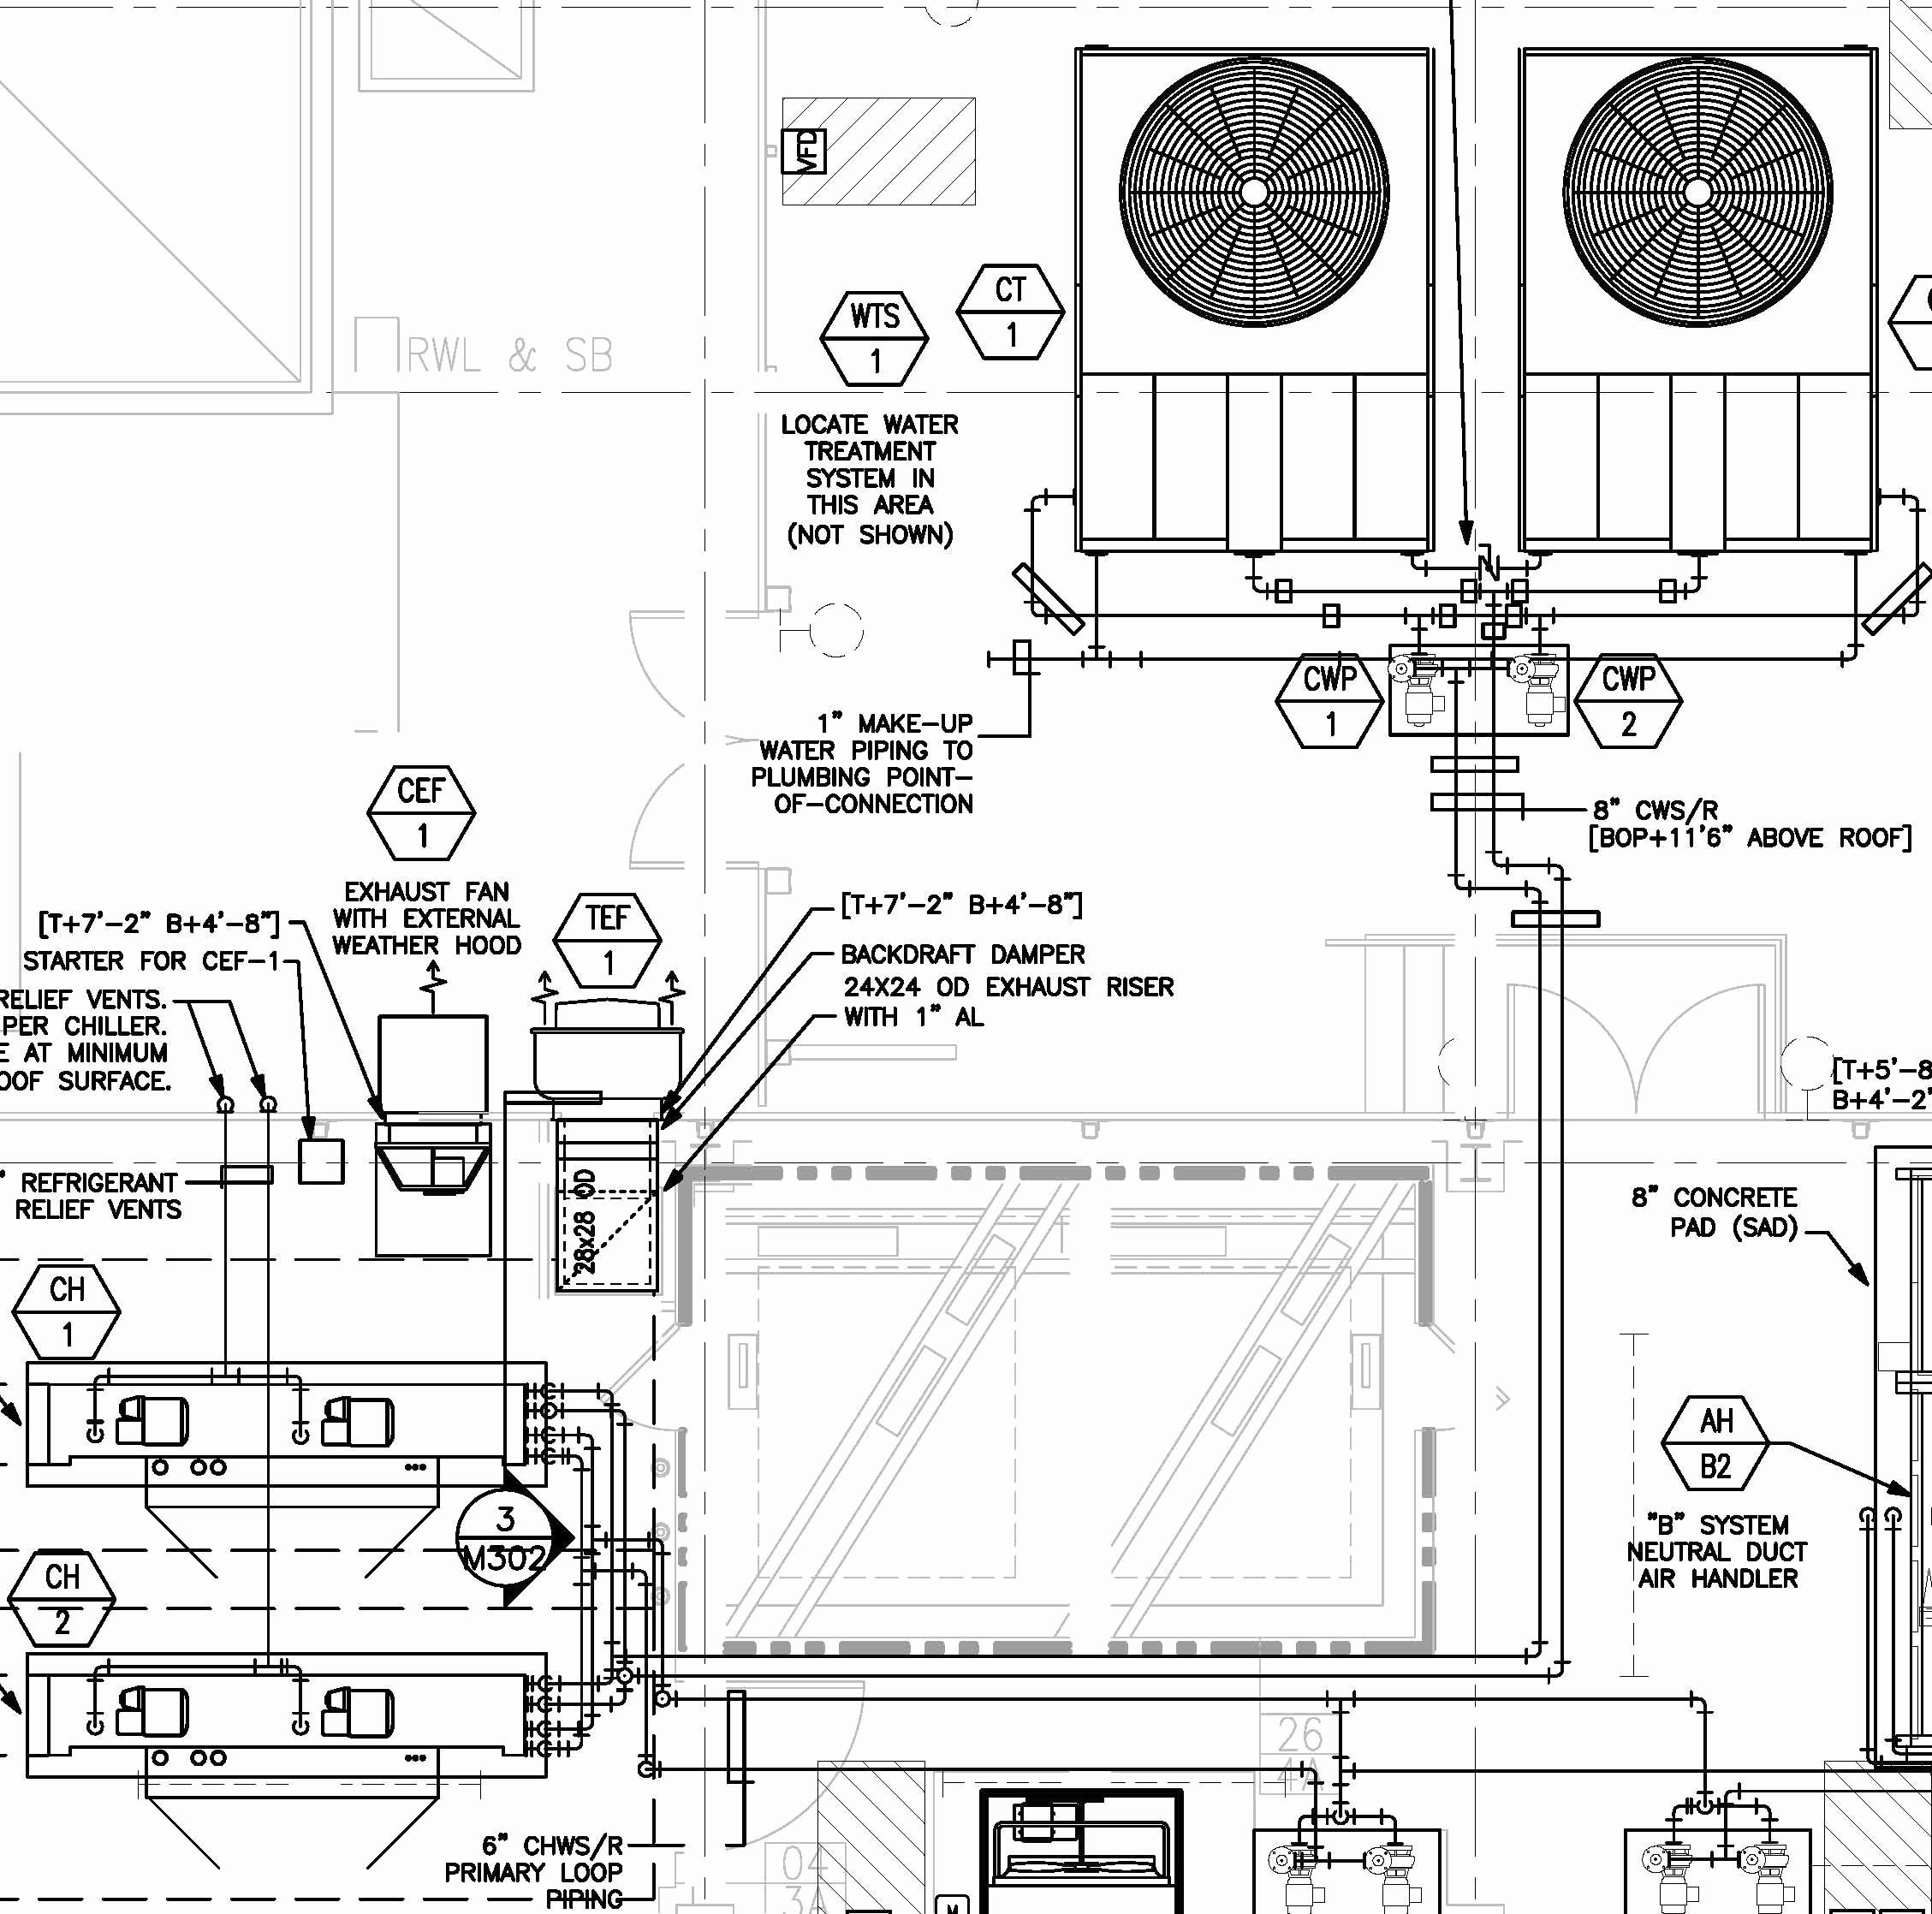 Well Pump Pressure Switch Wiring Diagram Wiring Diagram Water Pump Float Switch Save Well Tank Pressure Of Well Pump Pressure Switch Wiring Diagram